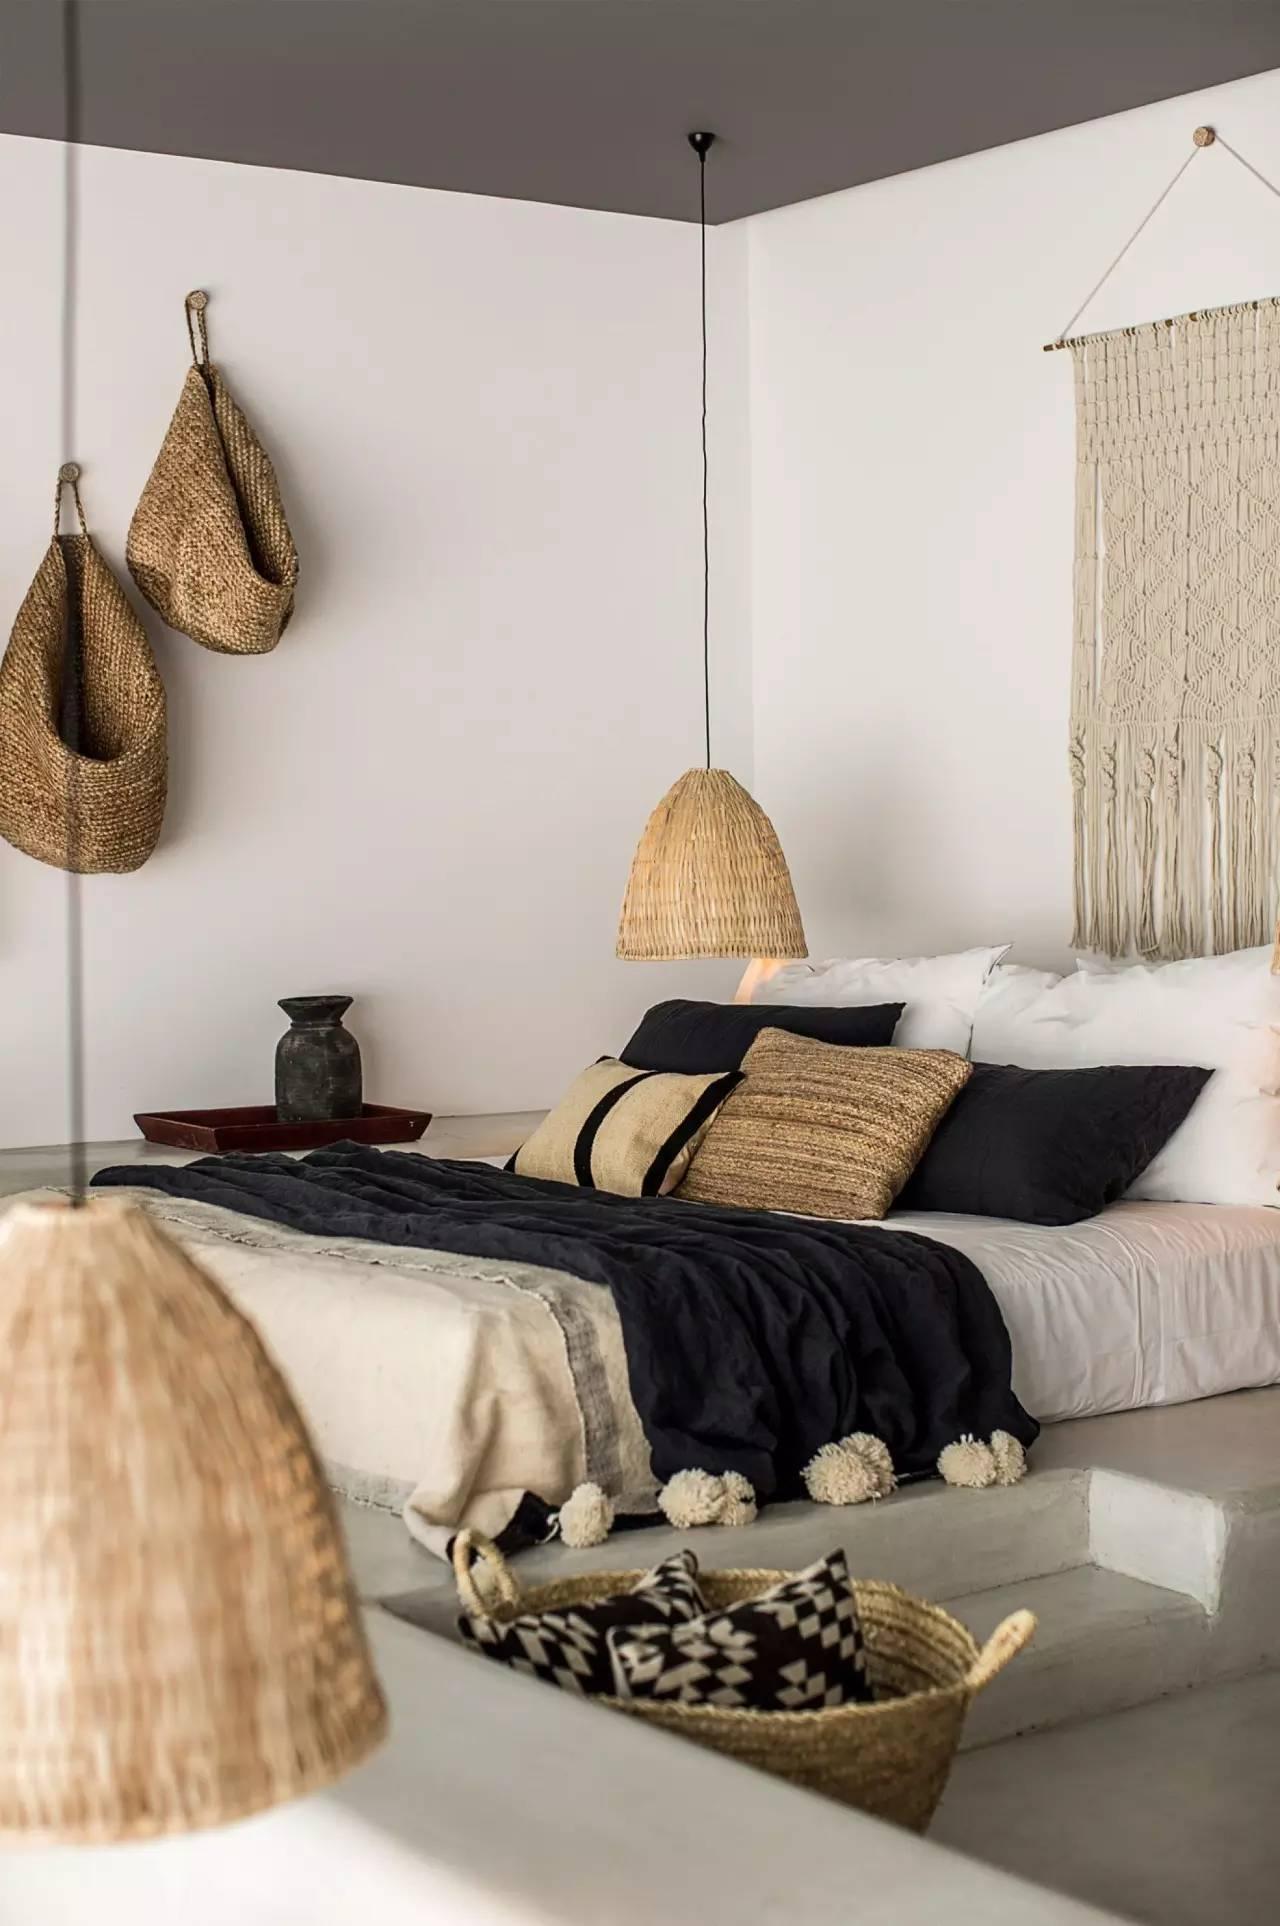 https://fem-fem.nl/app/uploads/2017/08/ibiza-huis-minimalistisch-riet-femfem.jpeg